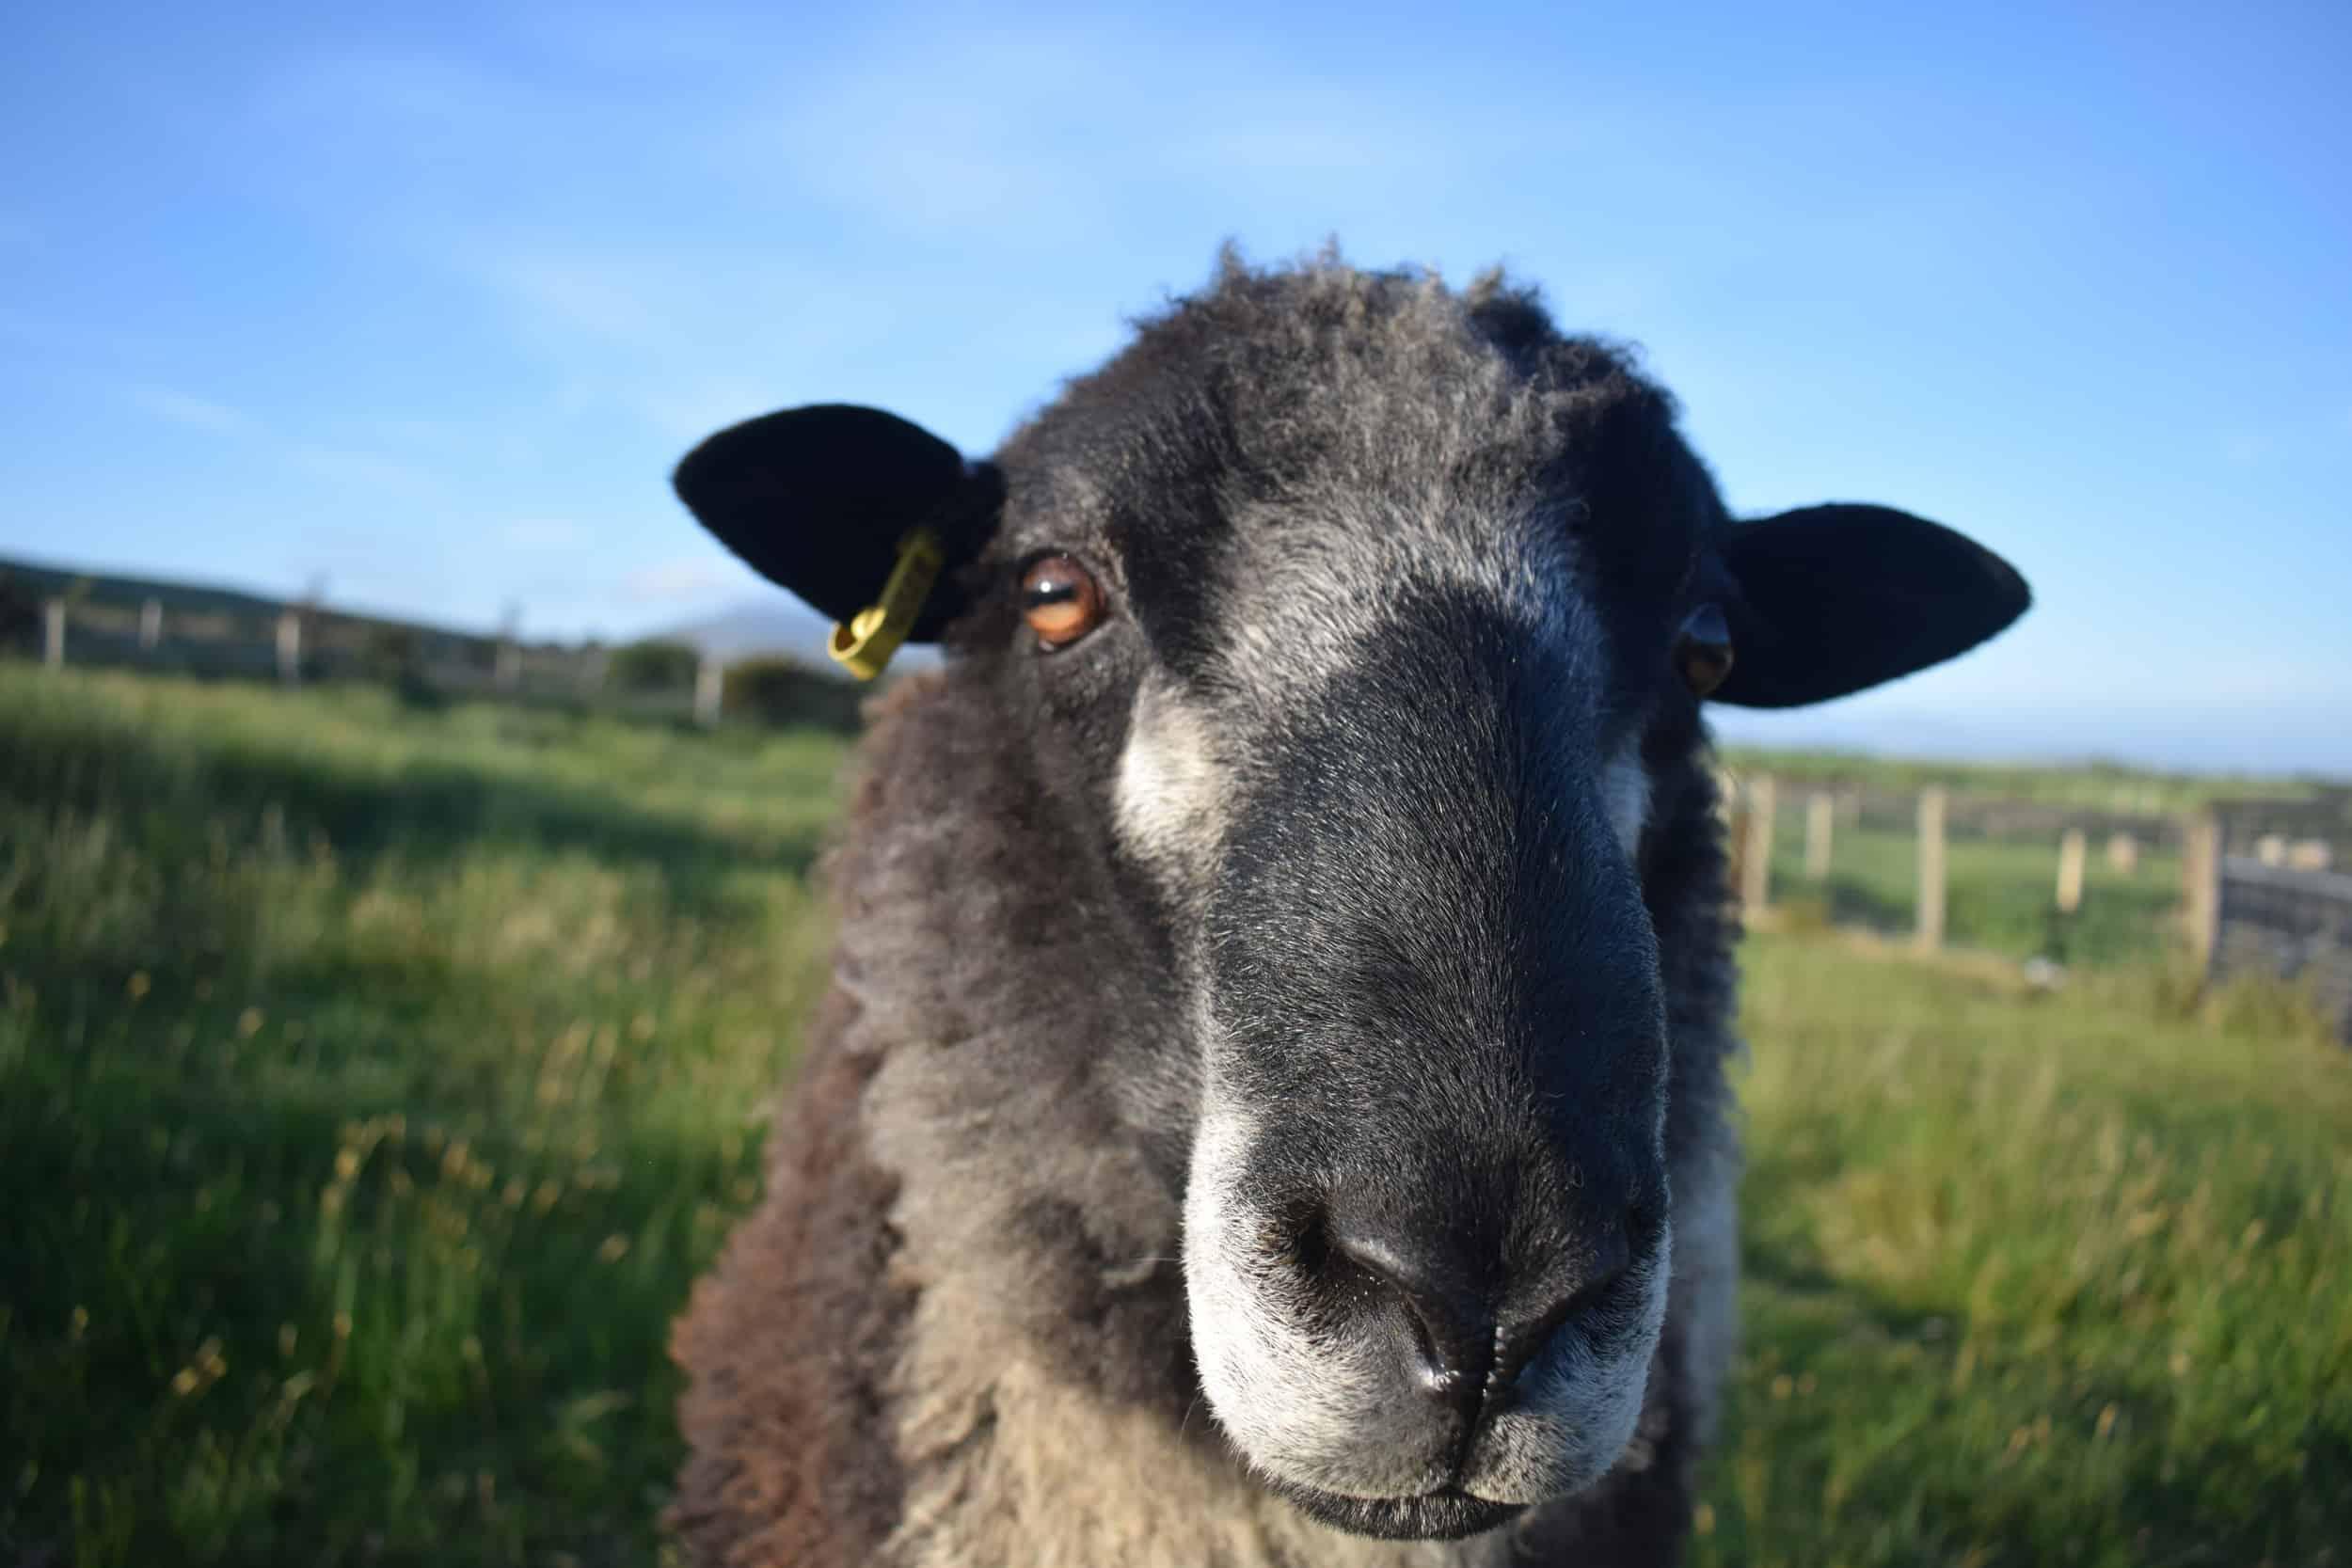 Bruno yearling ram coloured leicester longwool gotland shetland sheep crossbreed english blue kind fibre 3